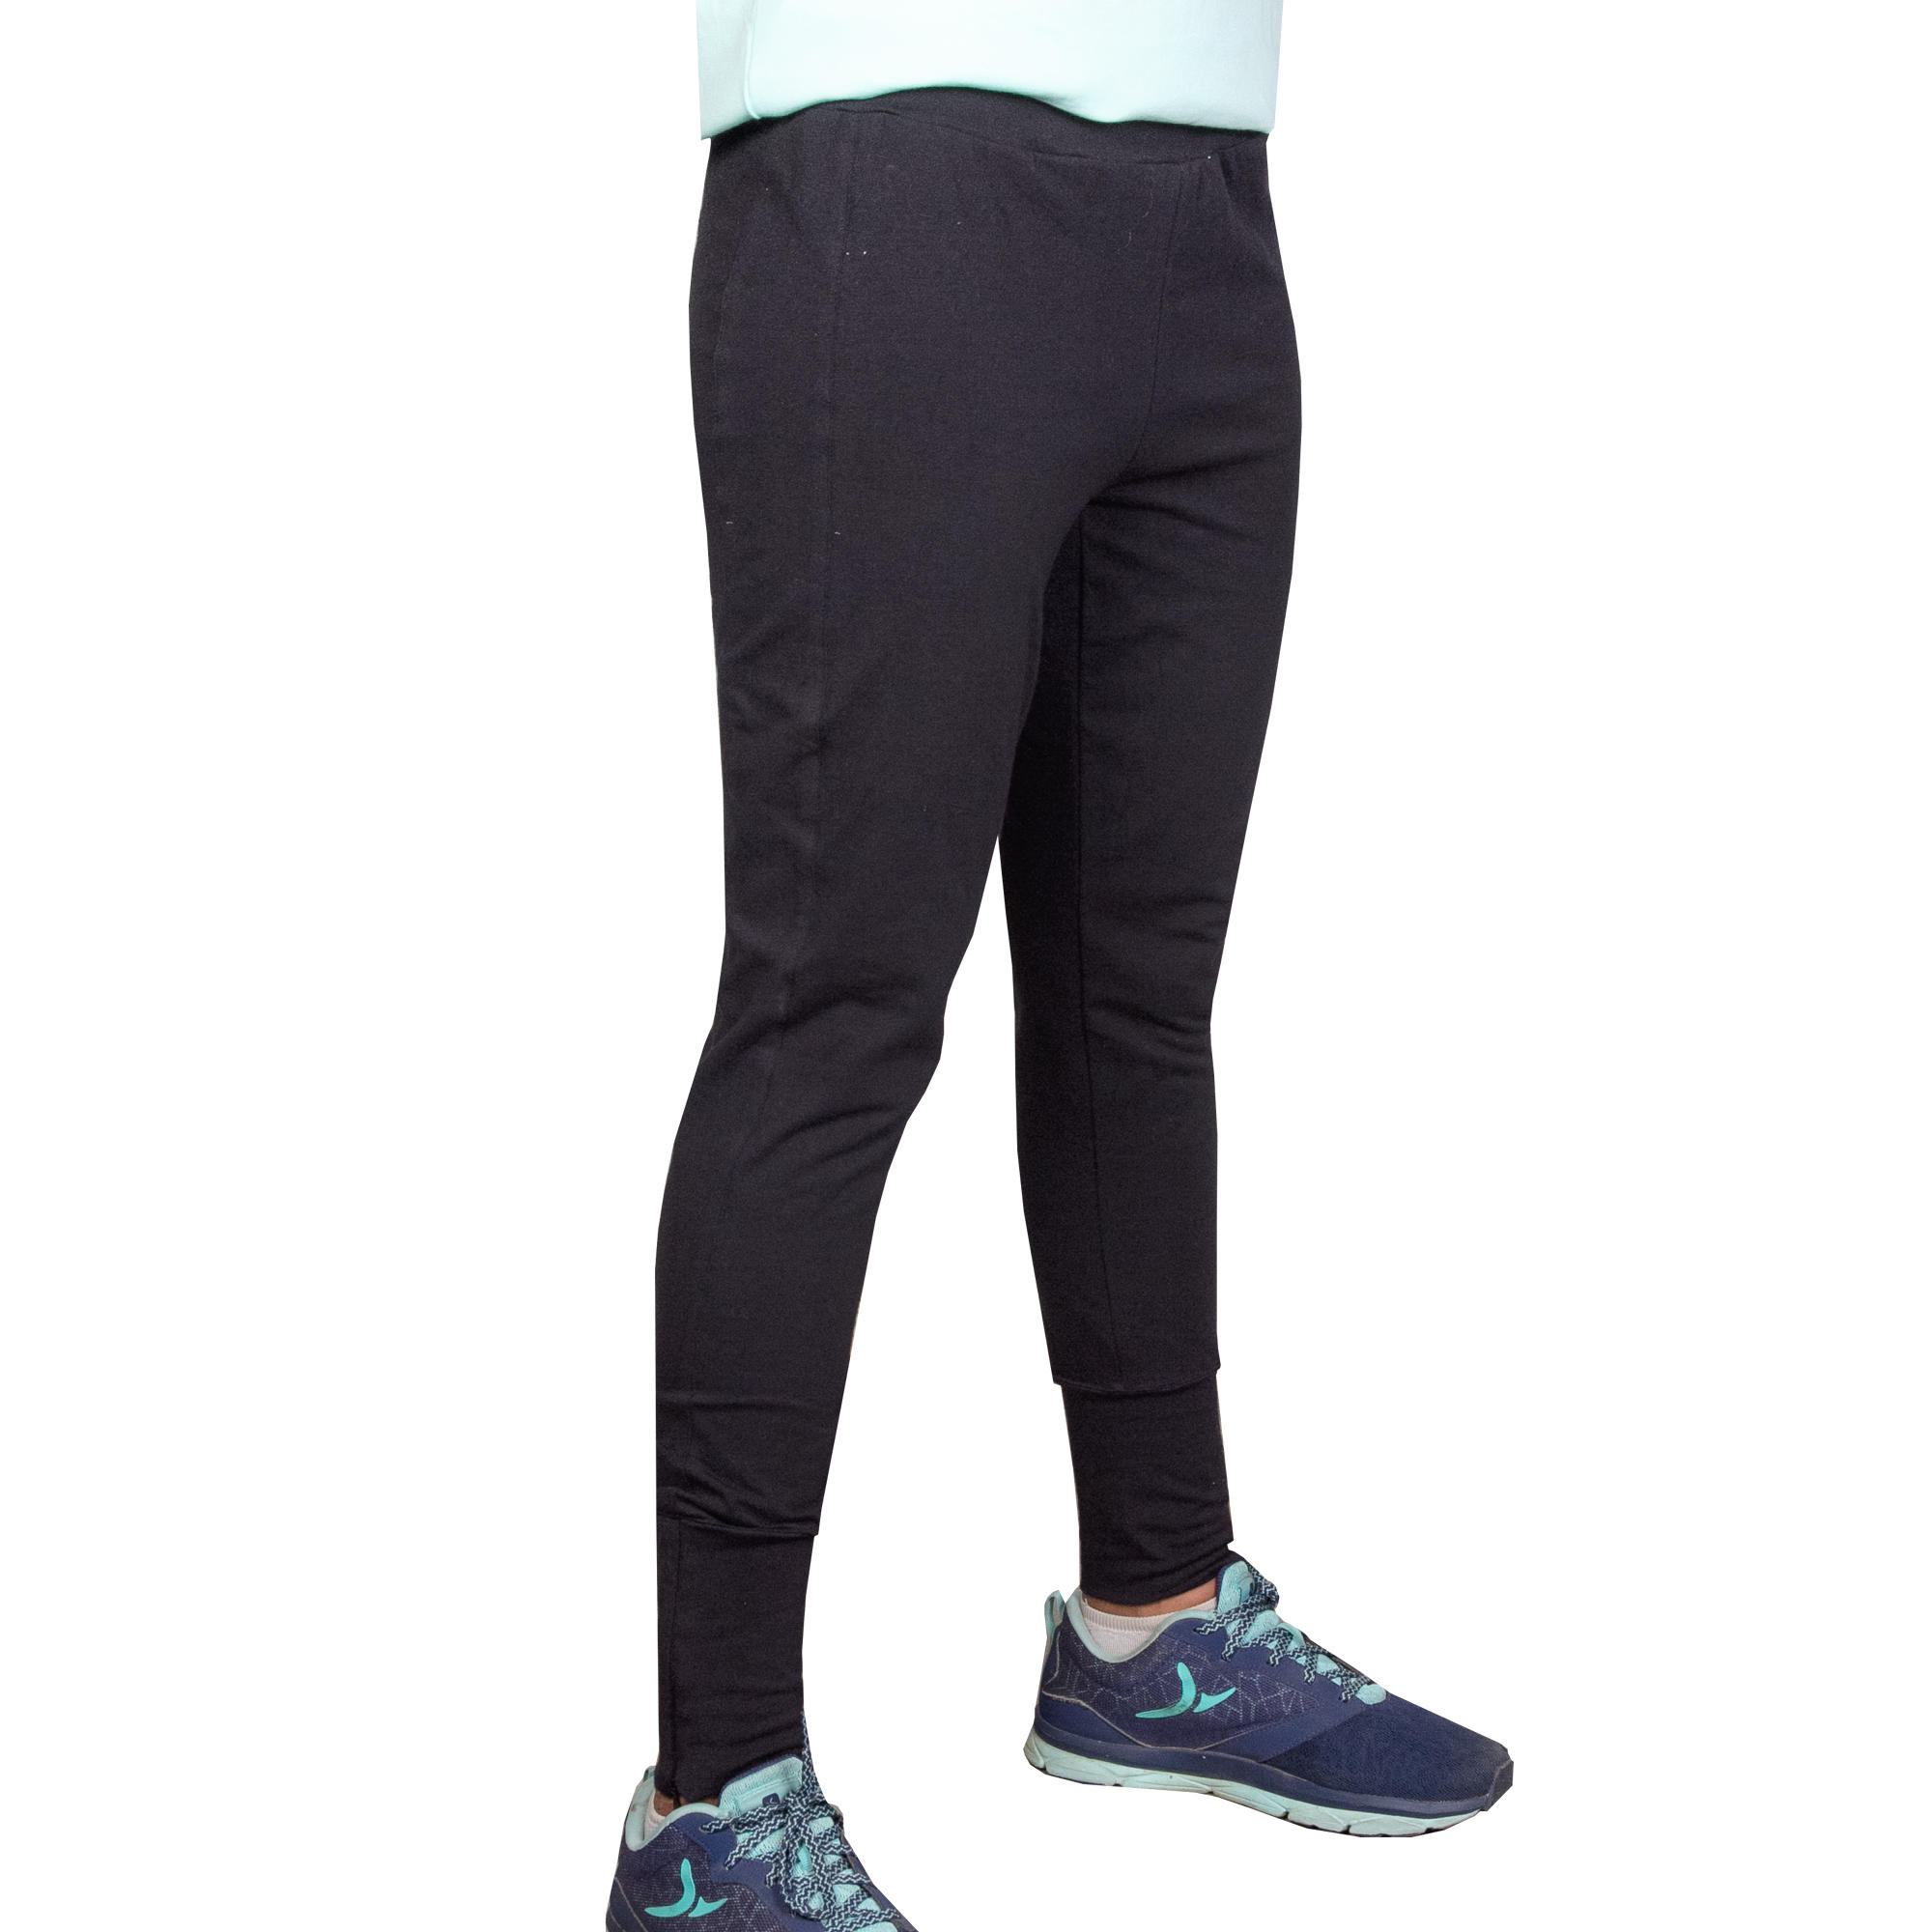 Women's Jumper Fit- Black